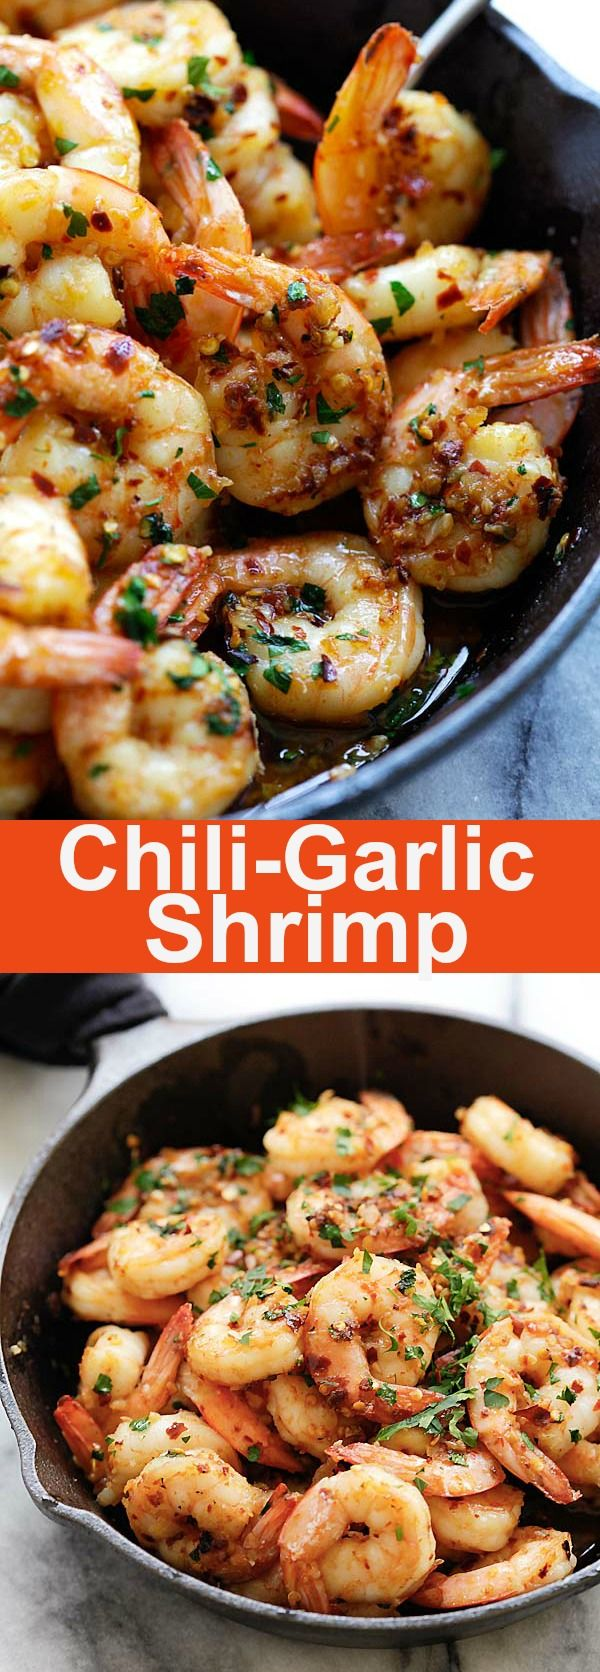 Chili Garlic Shrimp (Gambas Al Ajillo) – the best shrimp appetizer recipe you'll make. This Spanish chili garlic shrimp recipe is the bomb | rasamalaysia.com